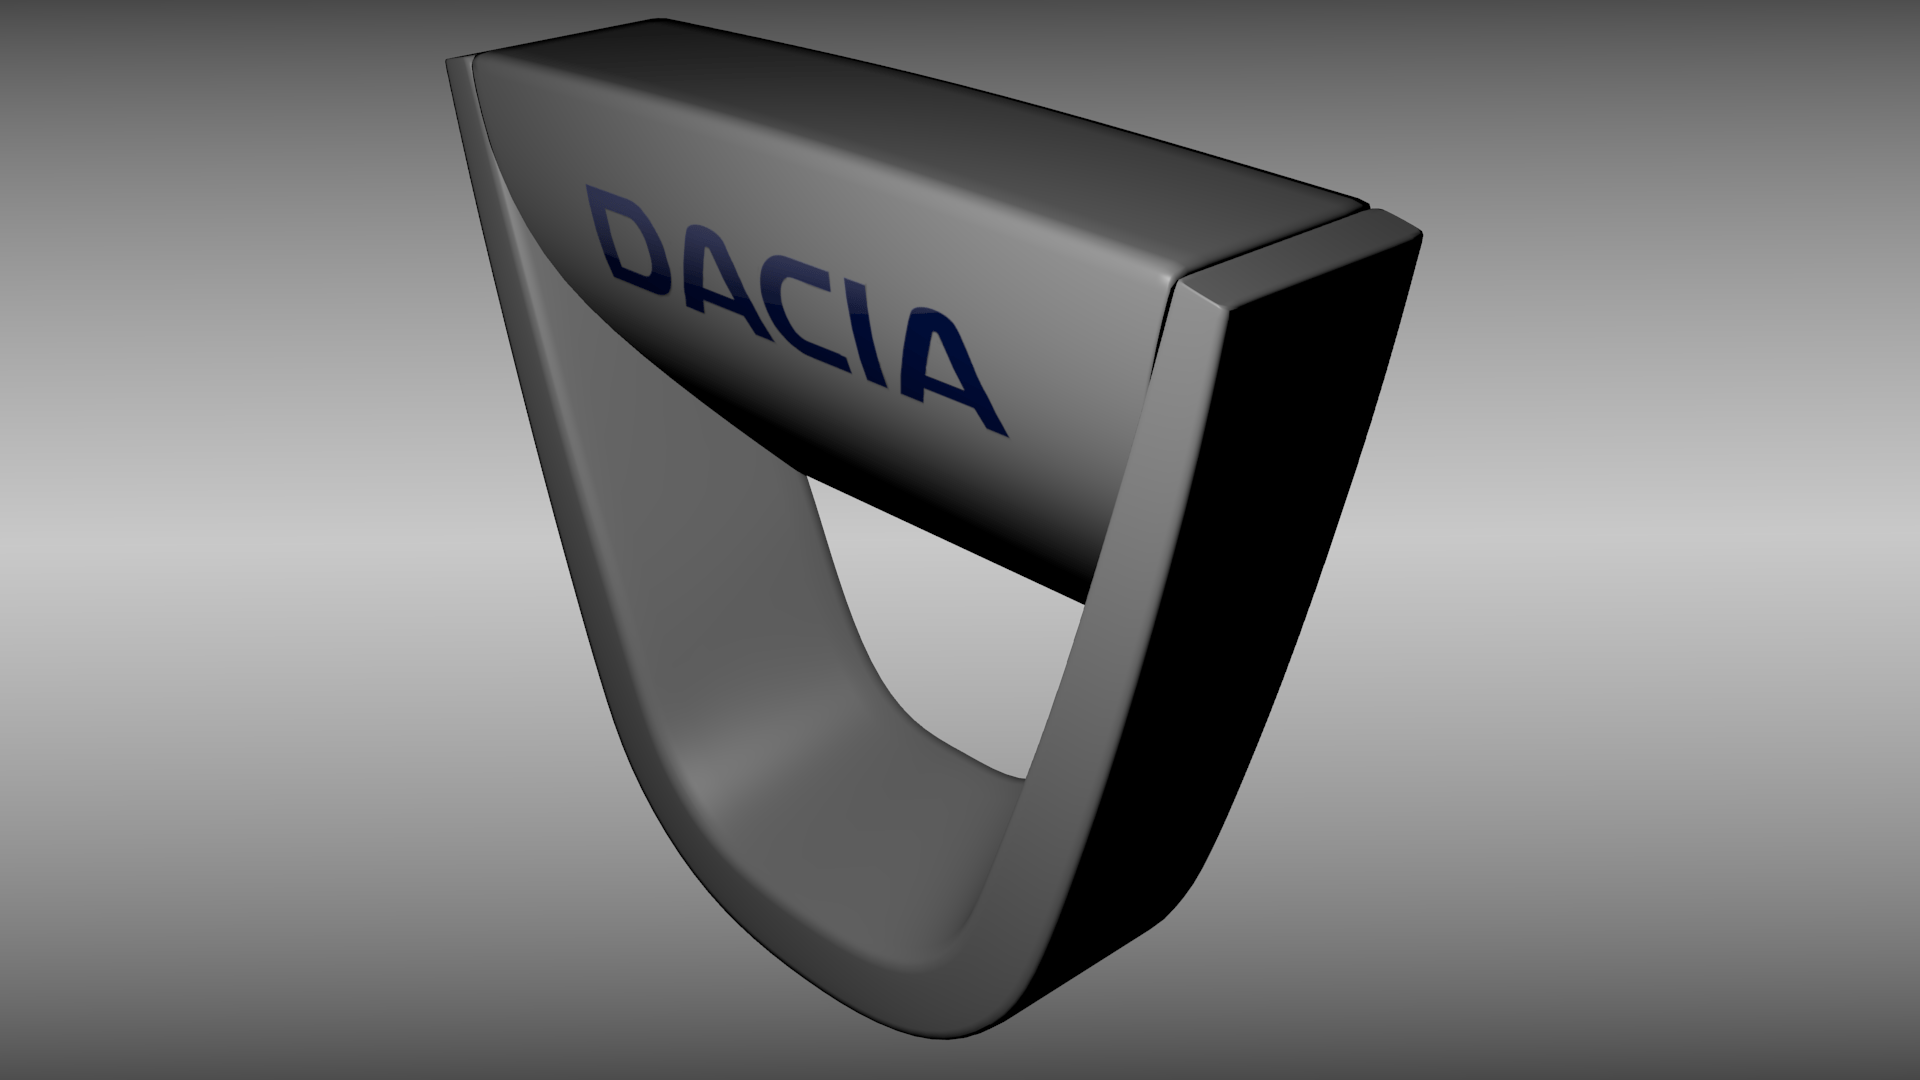 Low Poly Iphone Wallpaper Dacia Logo 3d Model Obj Blend Cgtrader Com